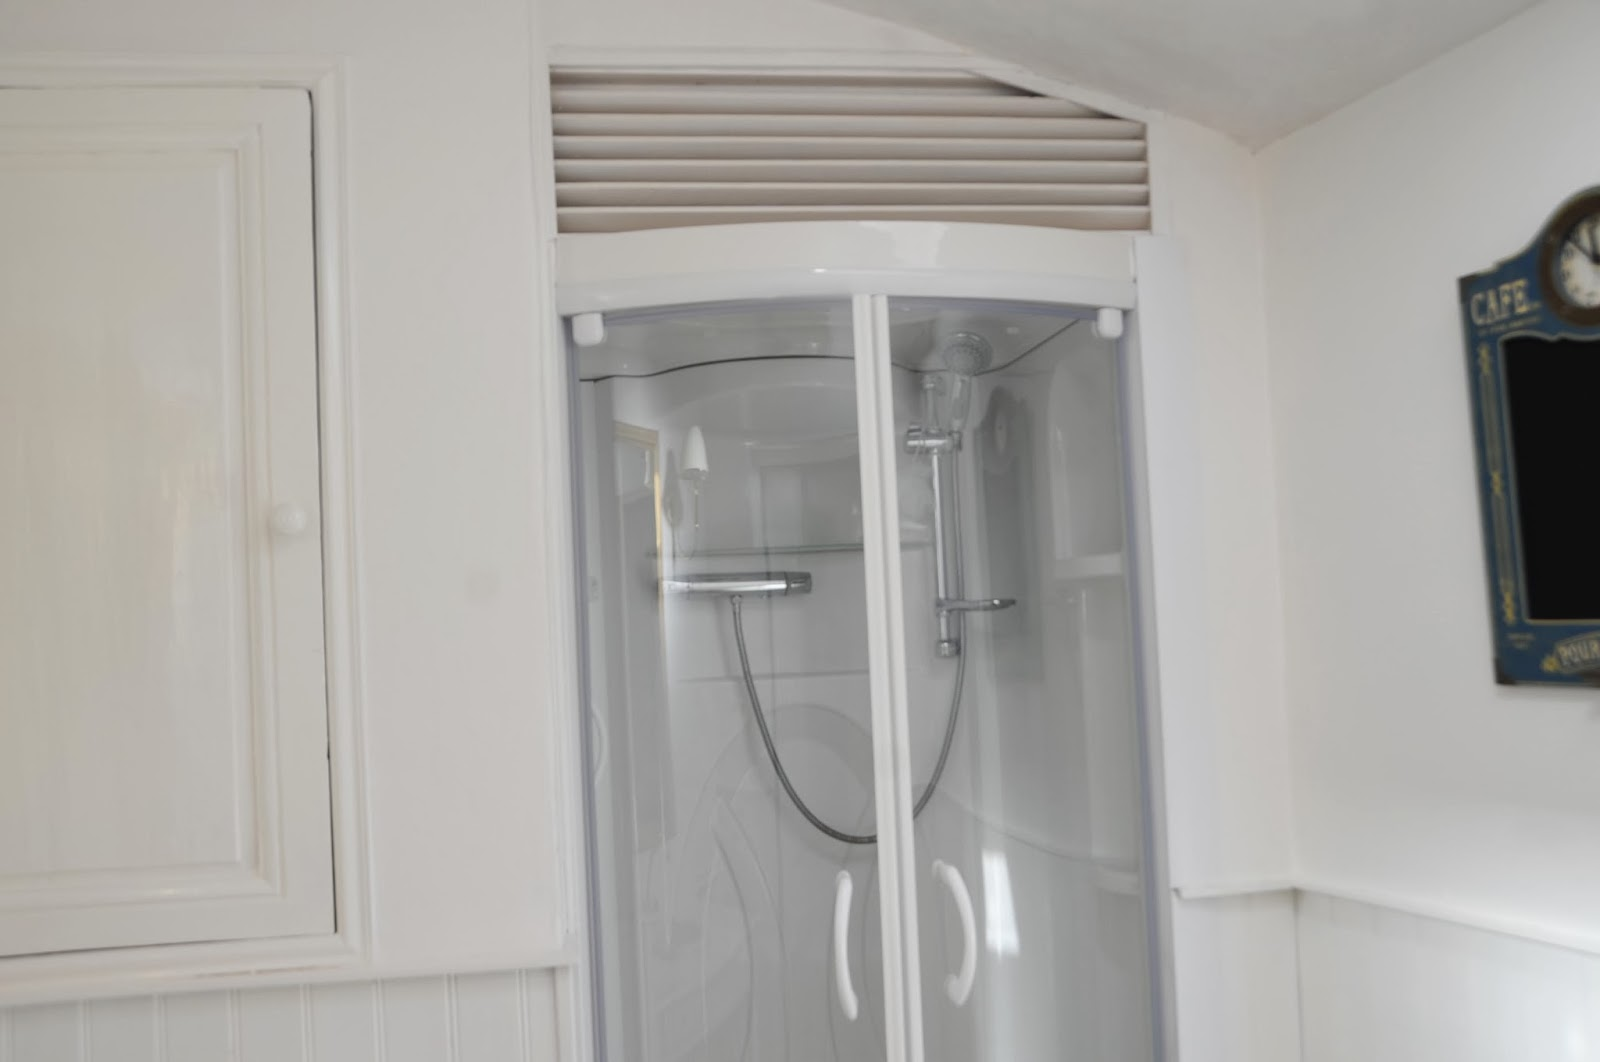 Saint pompon huis te koop 2 - Deco originele wc ...